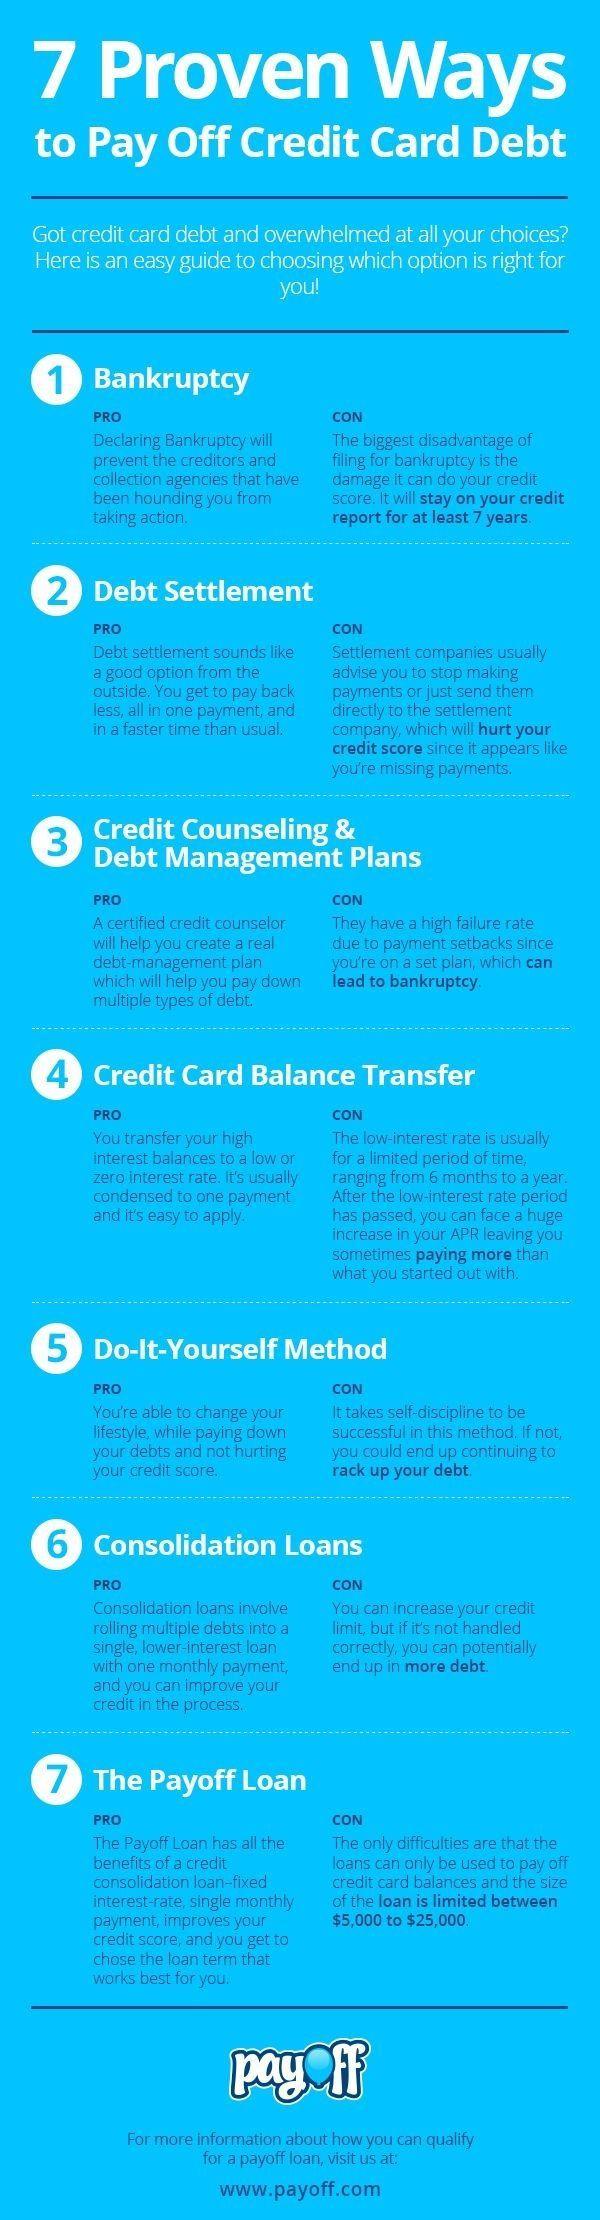 Refinancing Credit Card Debt And Reducing Interest Payoff Paying Off Credit Cards Credit Cards Debt Budgeting Money